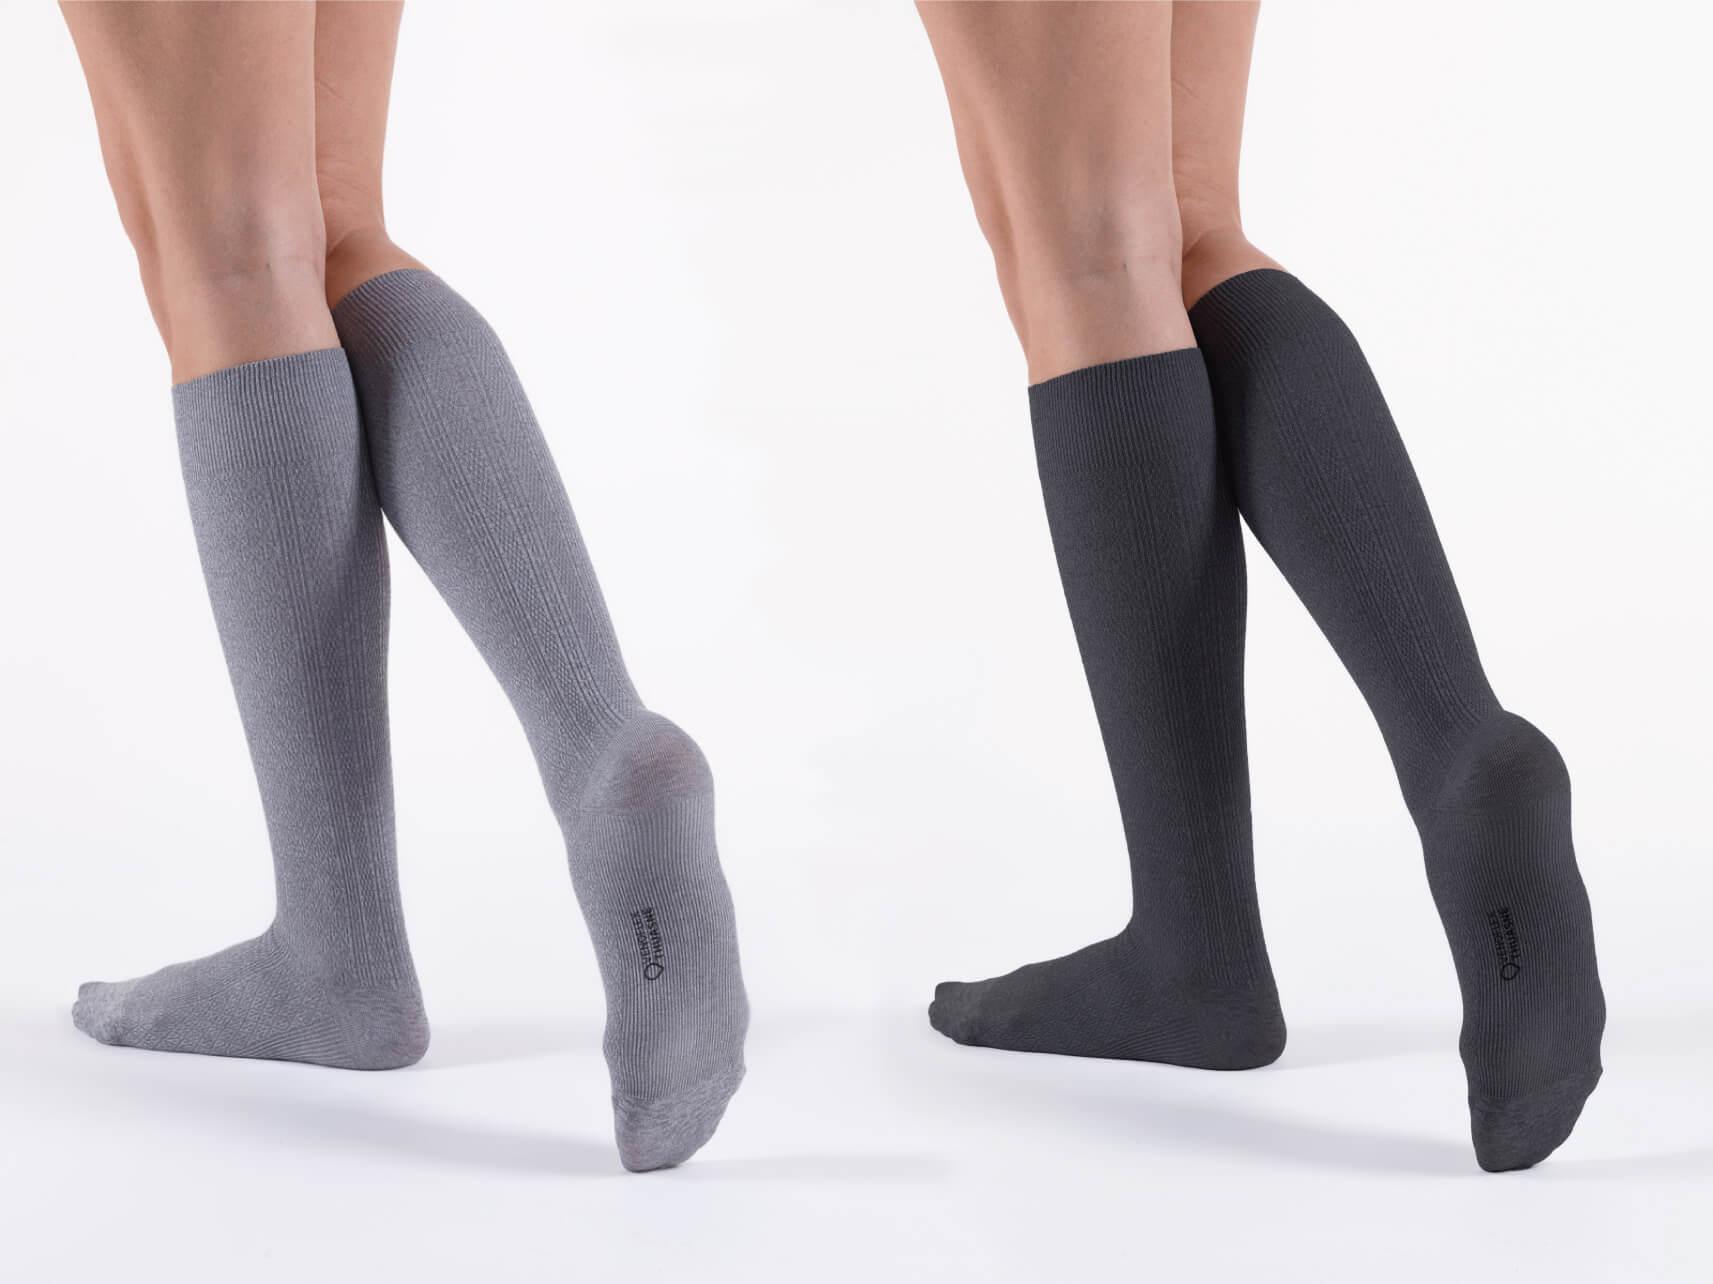 cas relax kompressziós térd zokni - pozitivemberek.hu